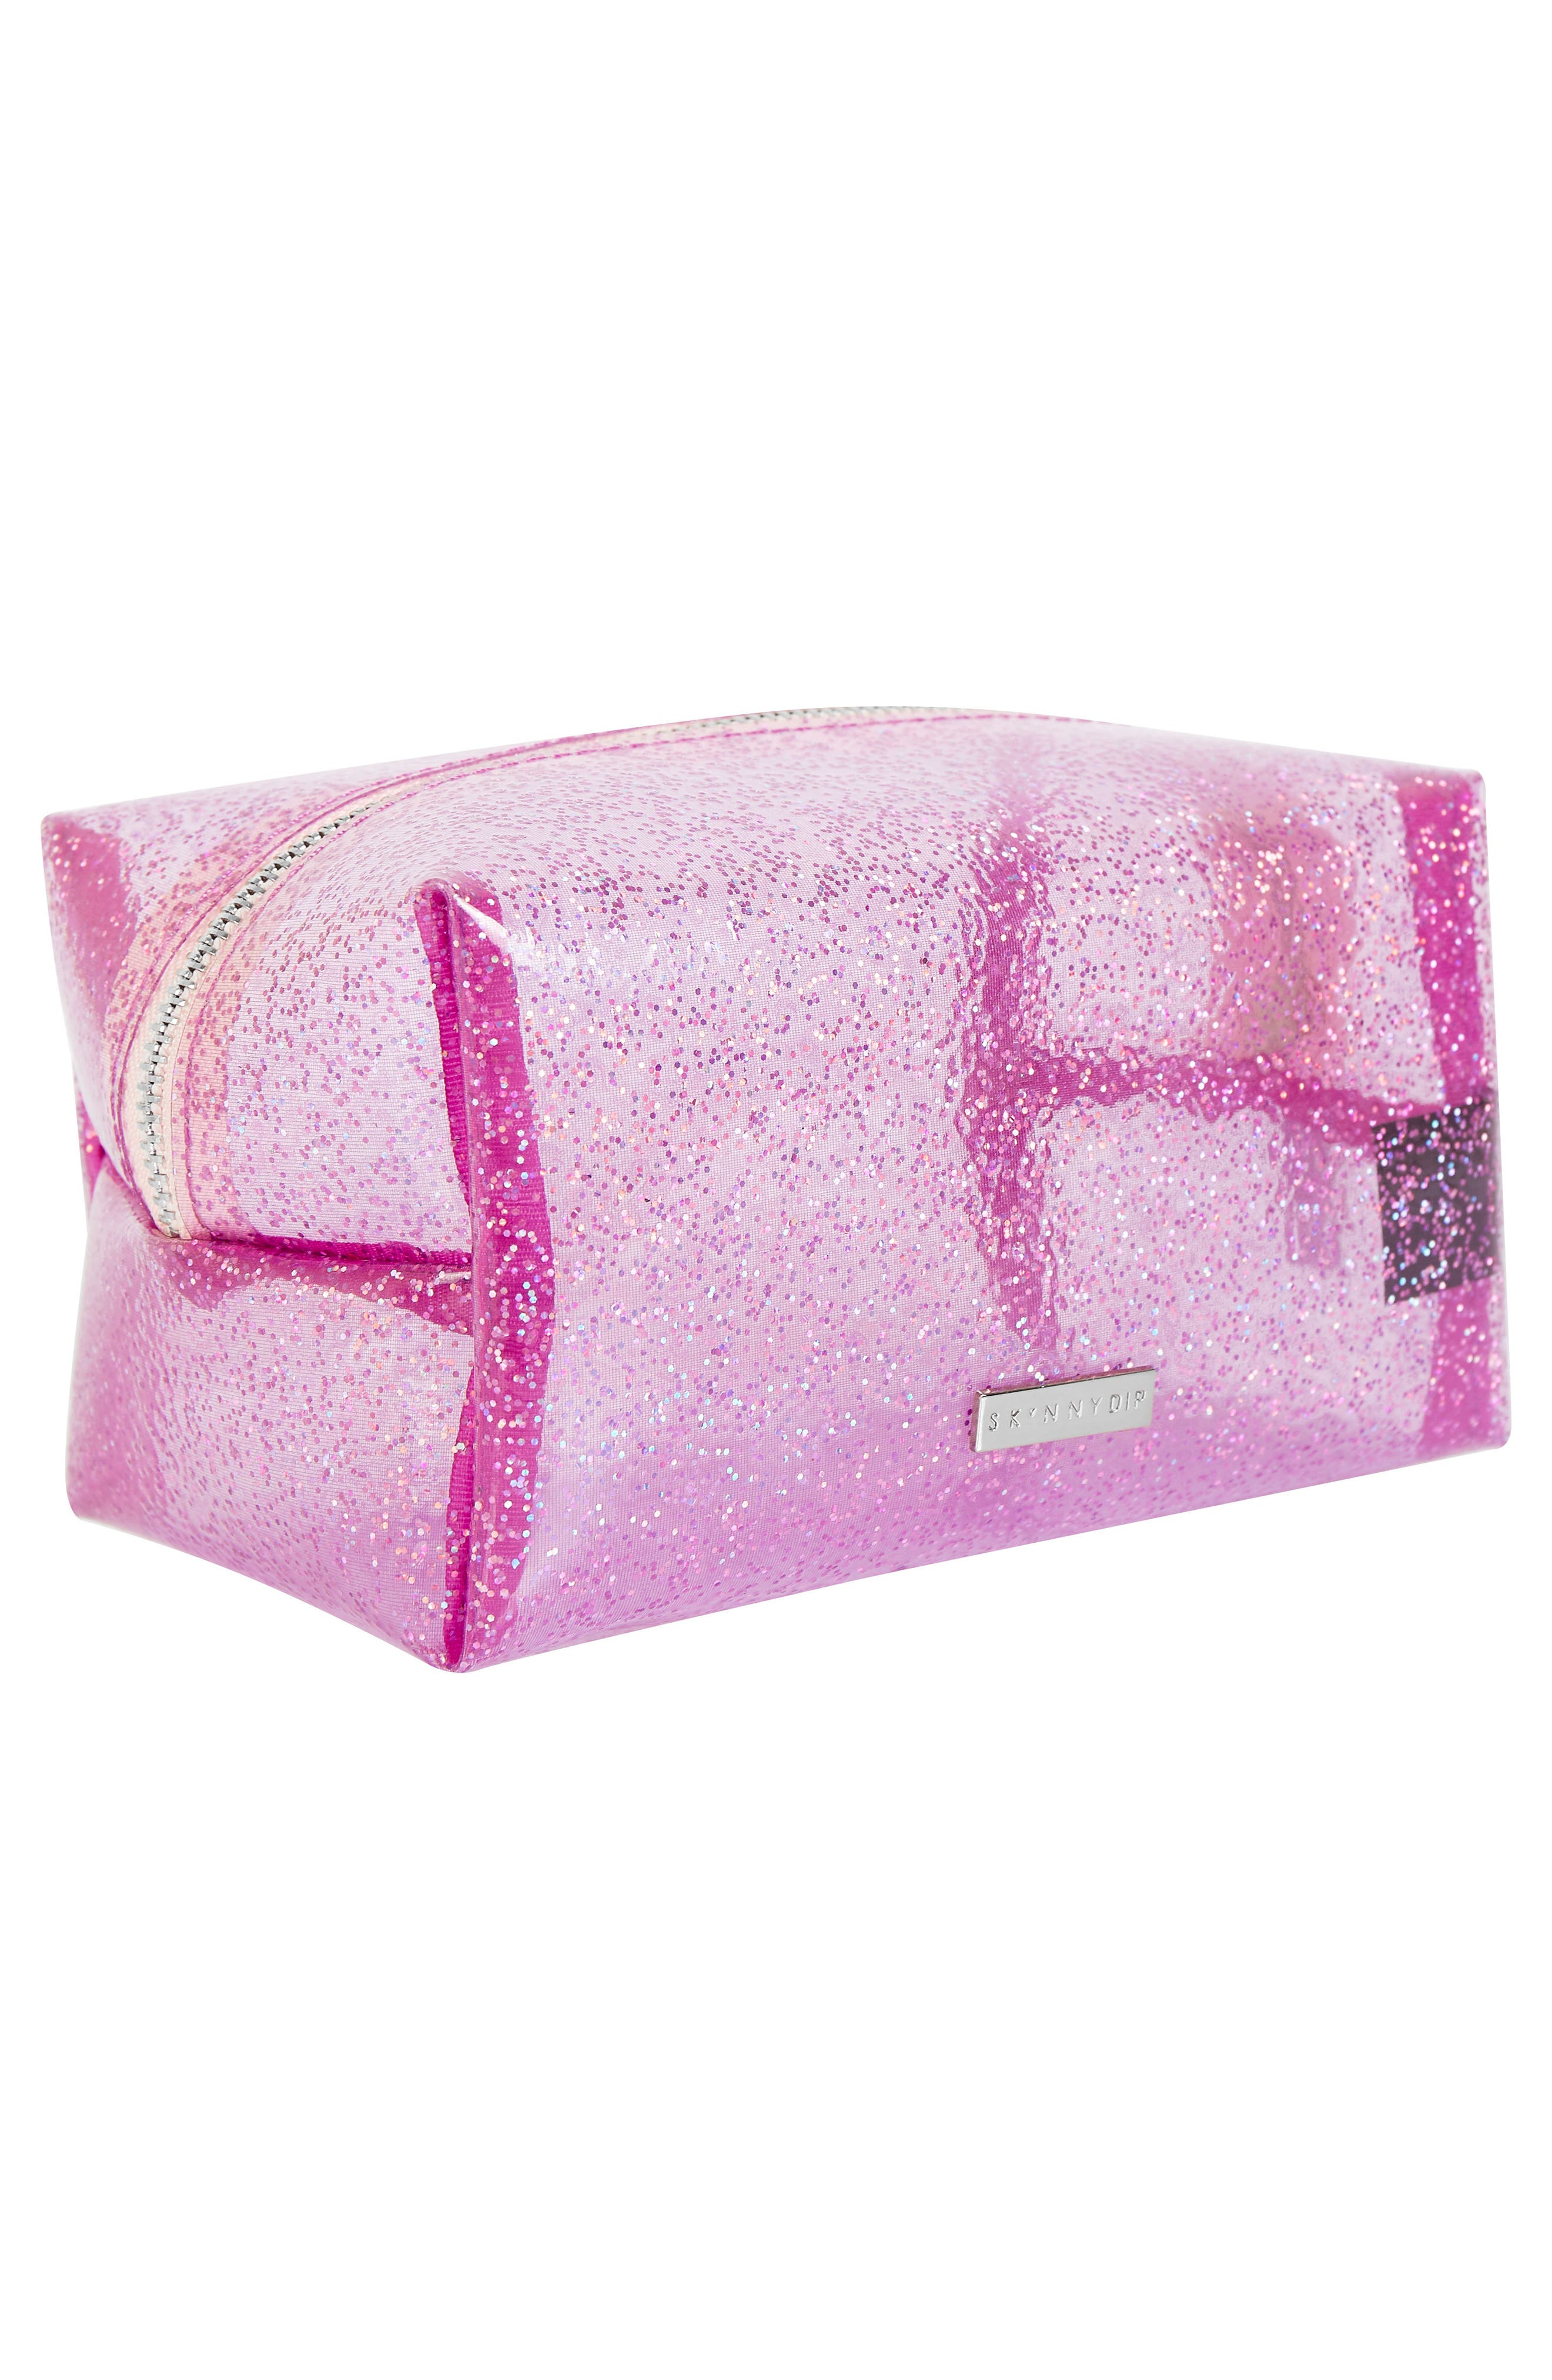 Glitter Bomb Makeup Bag,                             Alternate thumbnail 3, color,                             NO COLOR